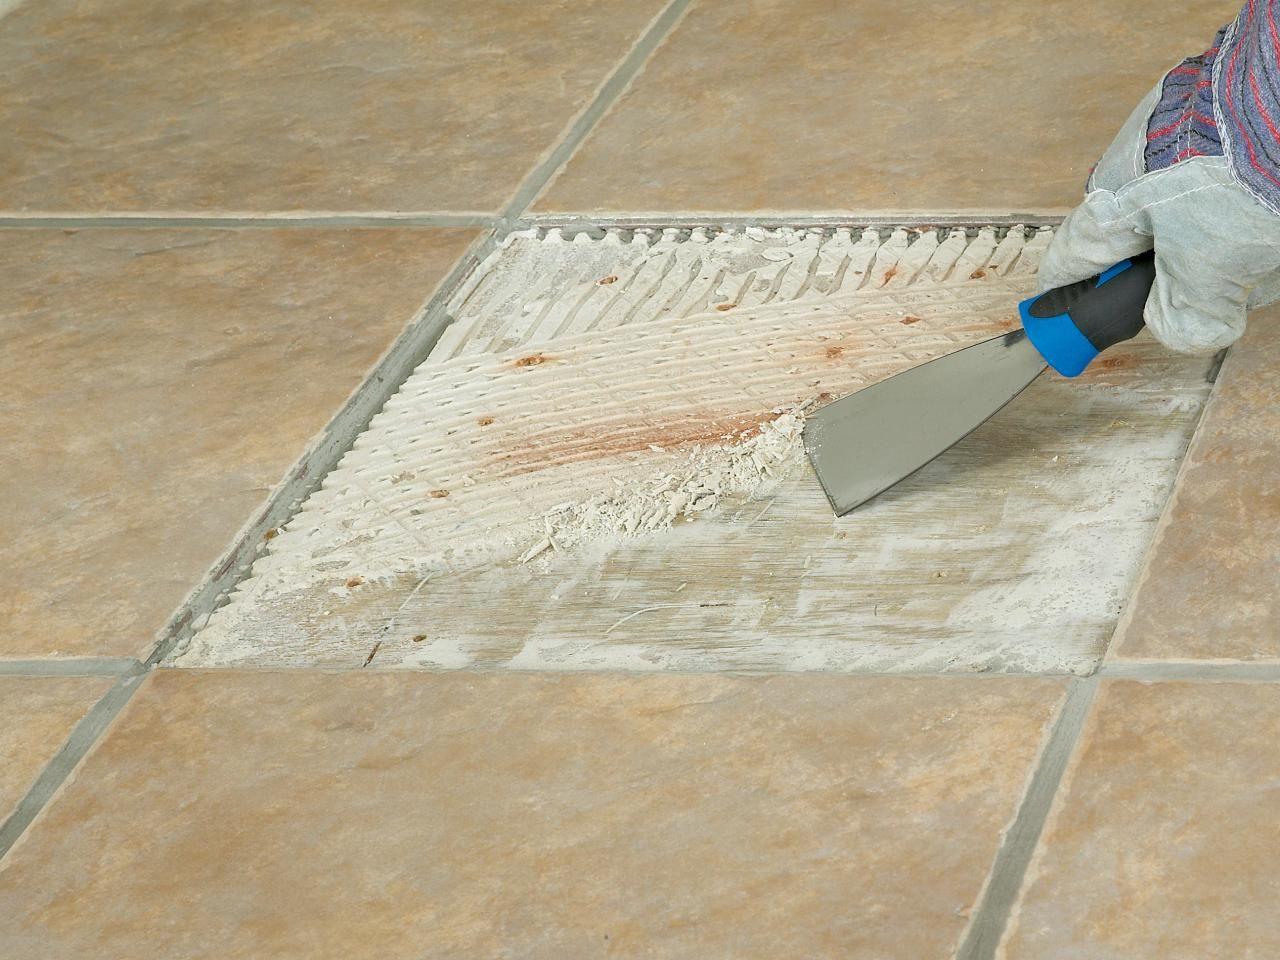 How To Replace A Broken Floor Tile Ceramic Floor Tile Tile Floor Bathroom Floor Tiles